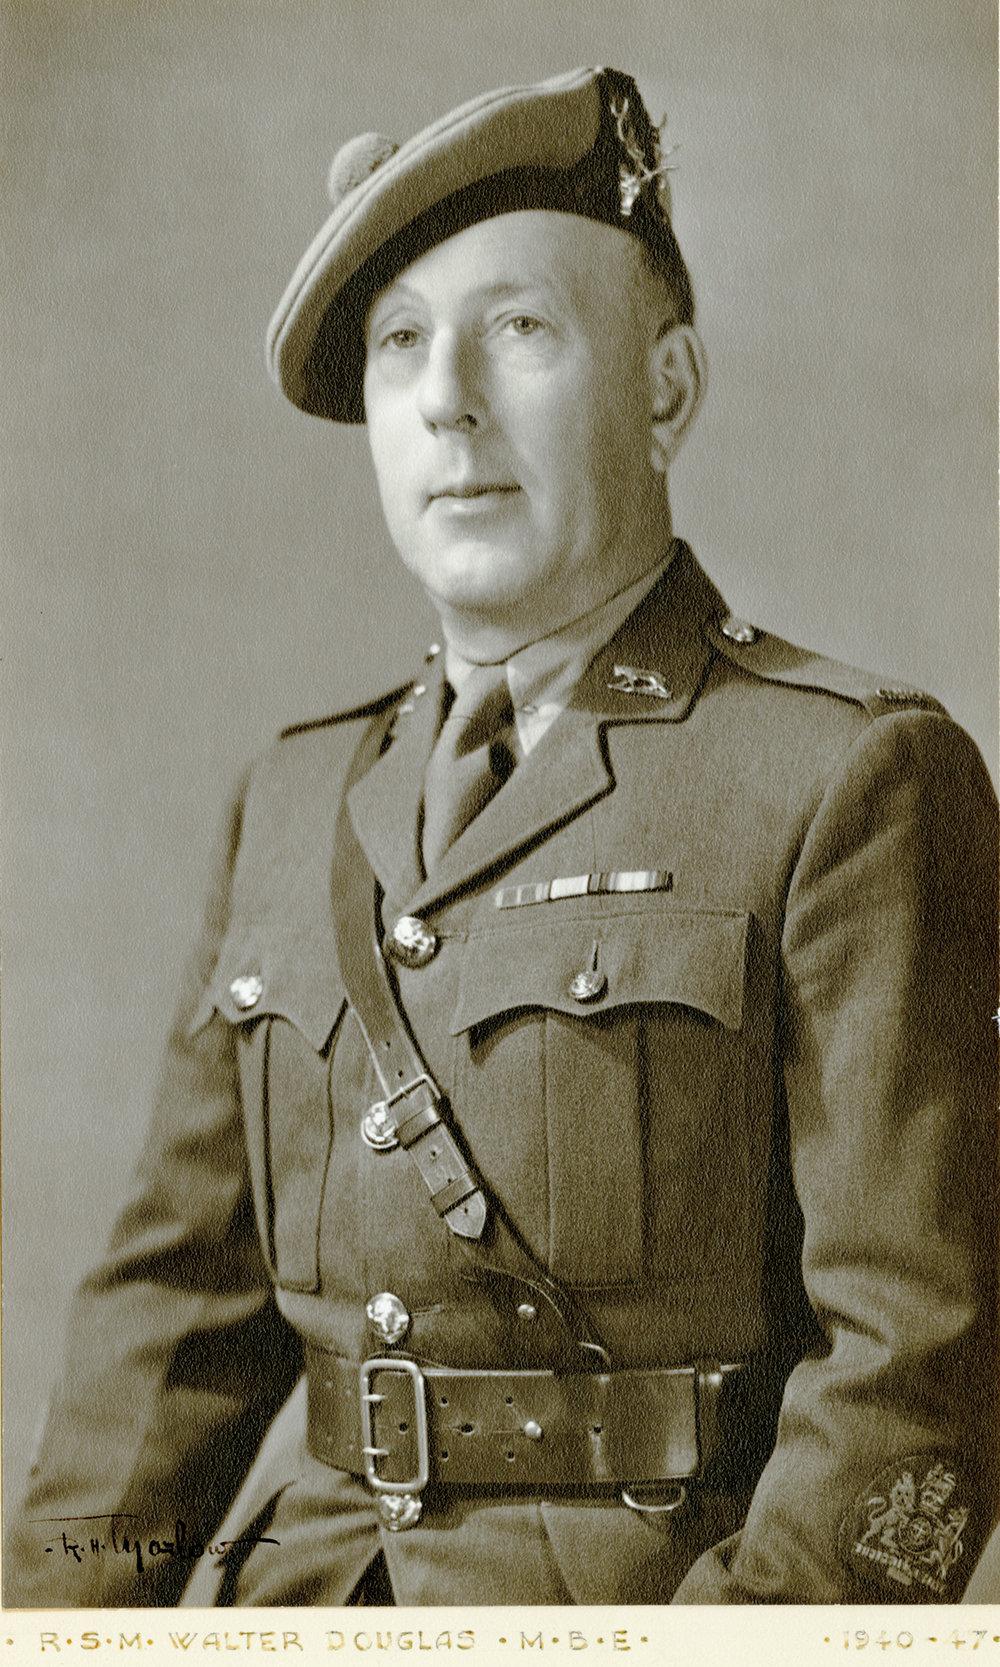 R.S.M. Walter Douglas